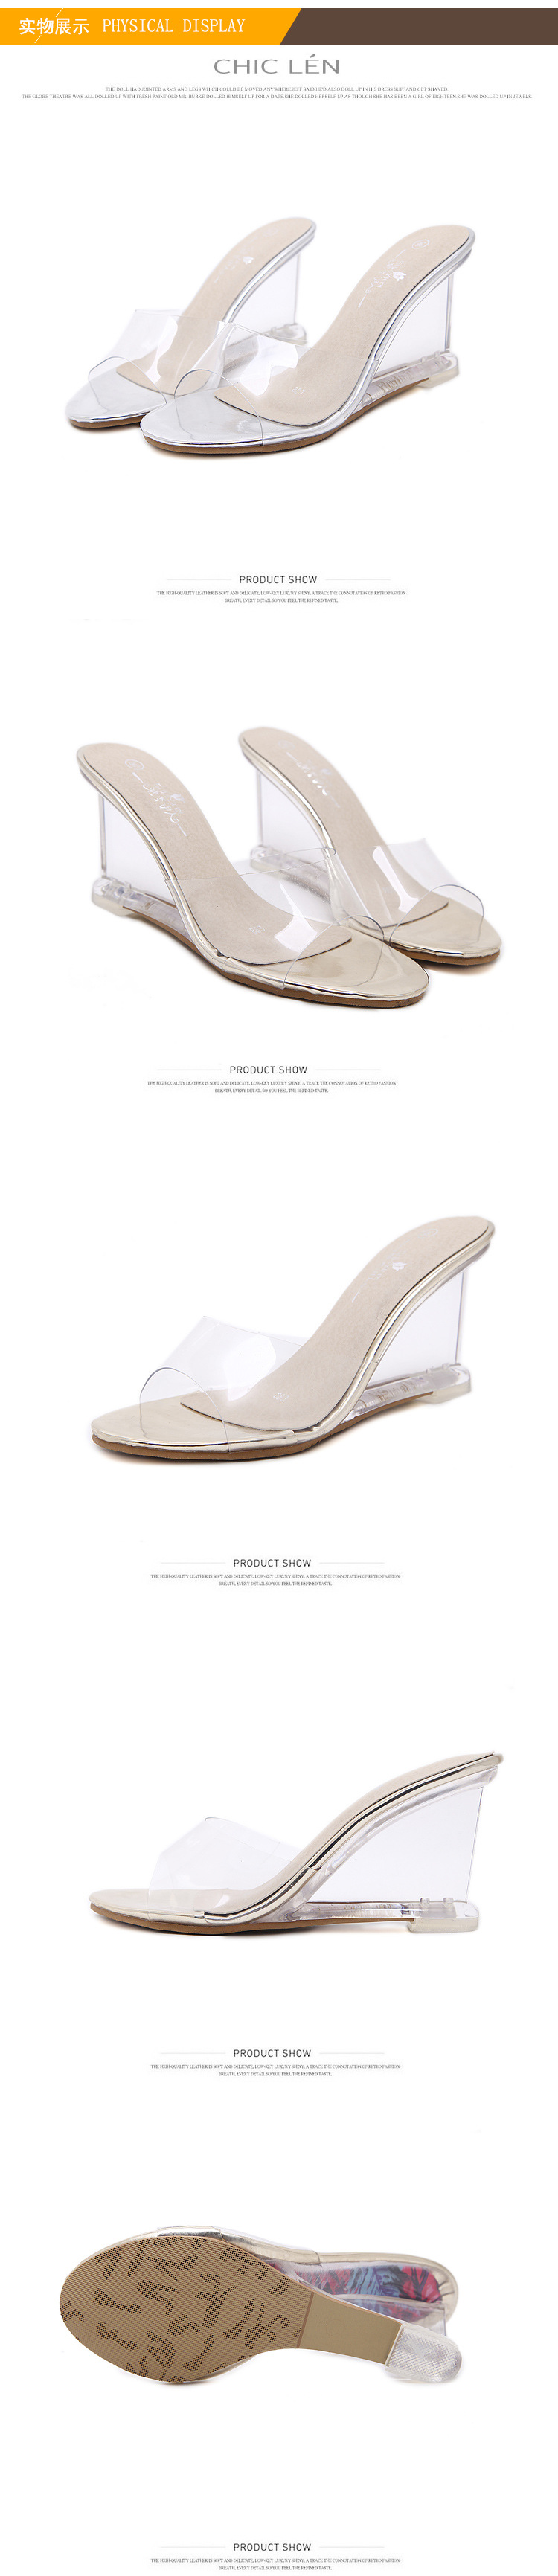 HTB1DUU6KeGSBuNjSspbq6AiipXaV HOKSZVY Women Slipper High Heels Summer Summer Women's Shoes Word Buckle Simple Wedge Sandals Transparent Clear Shoes LFD-833-2